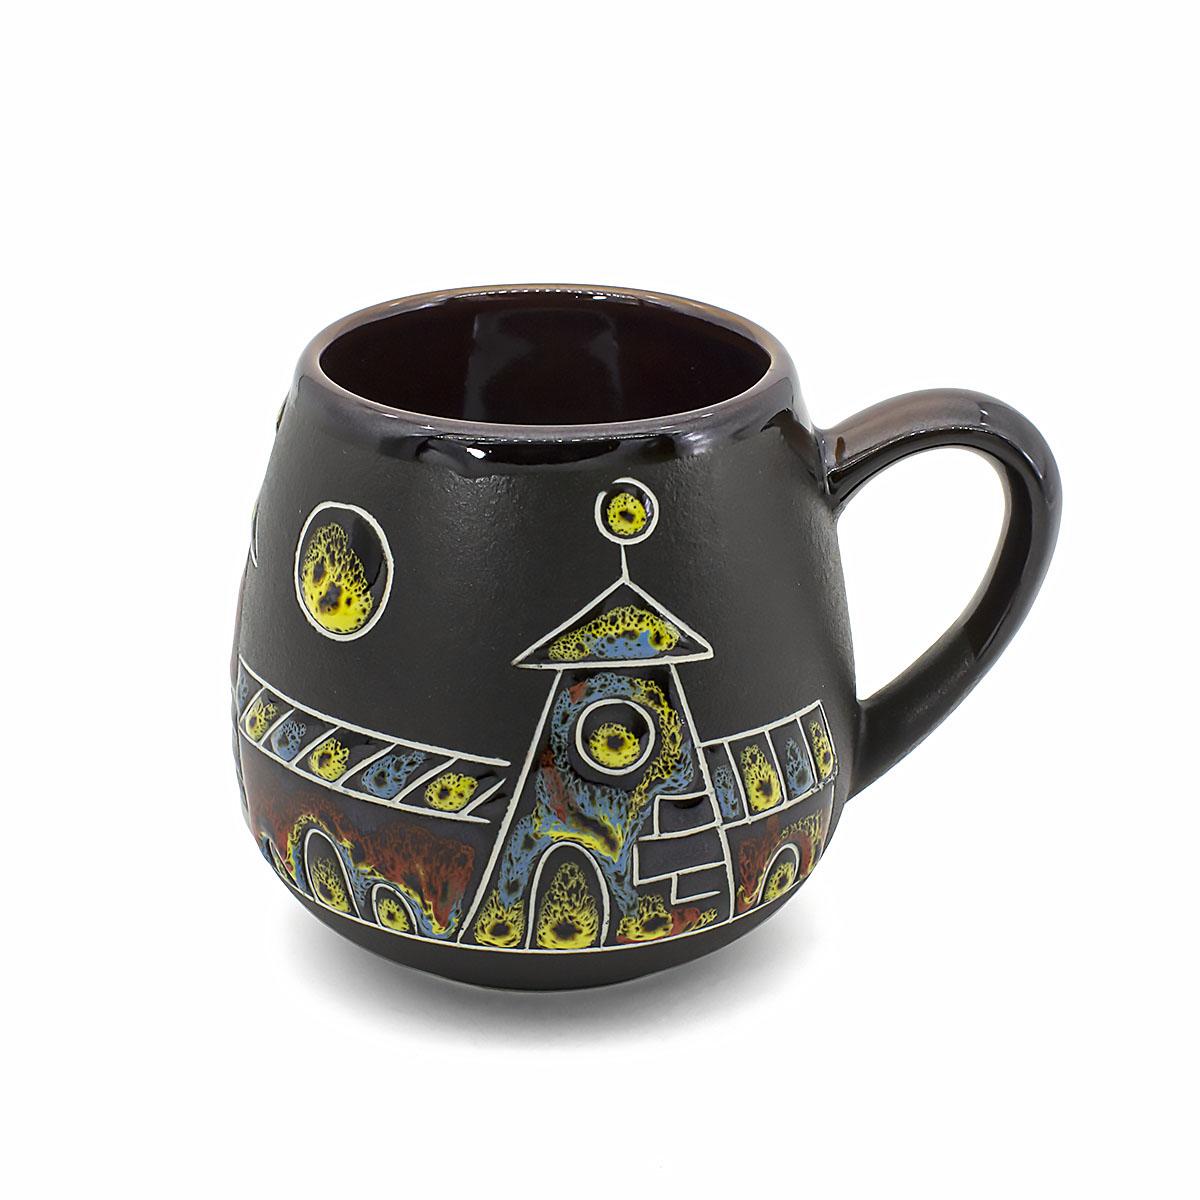 чашка глиняная малиновый щербет 350 мл Чашка глиняная Город, 350 мл